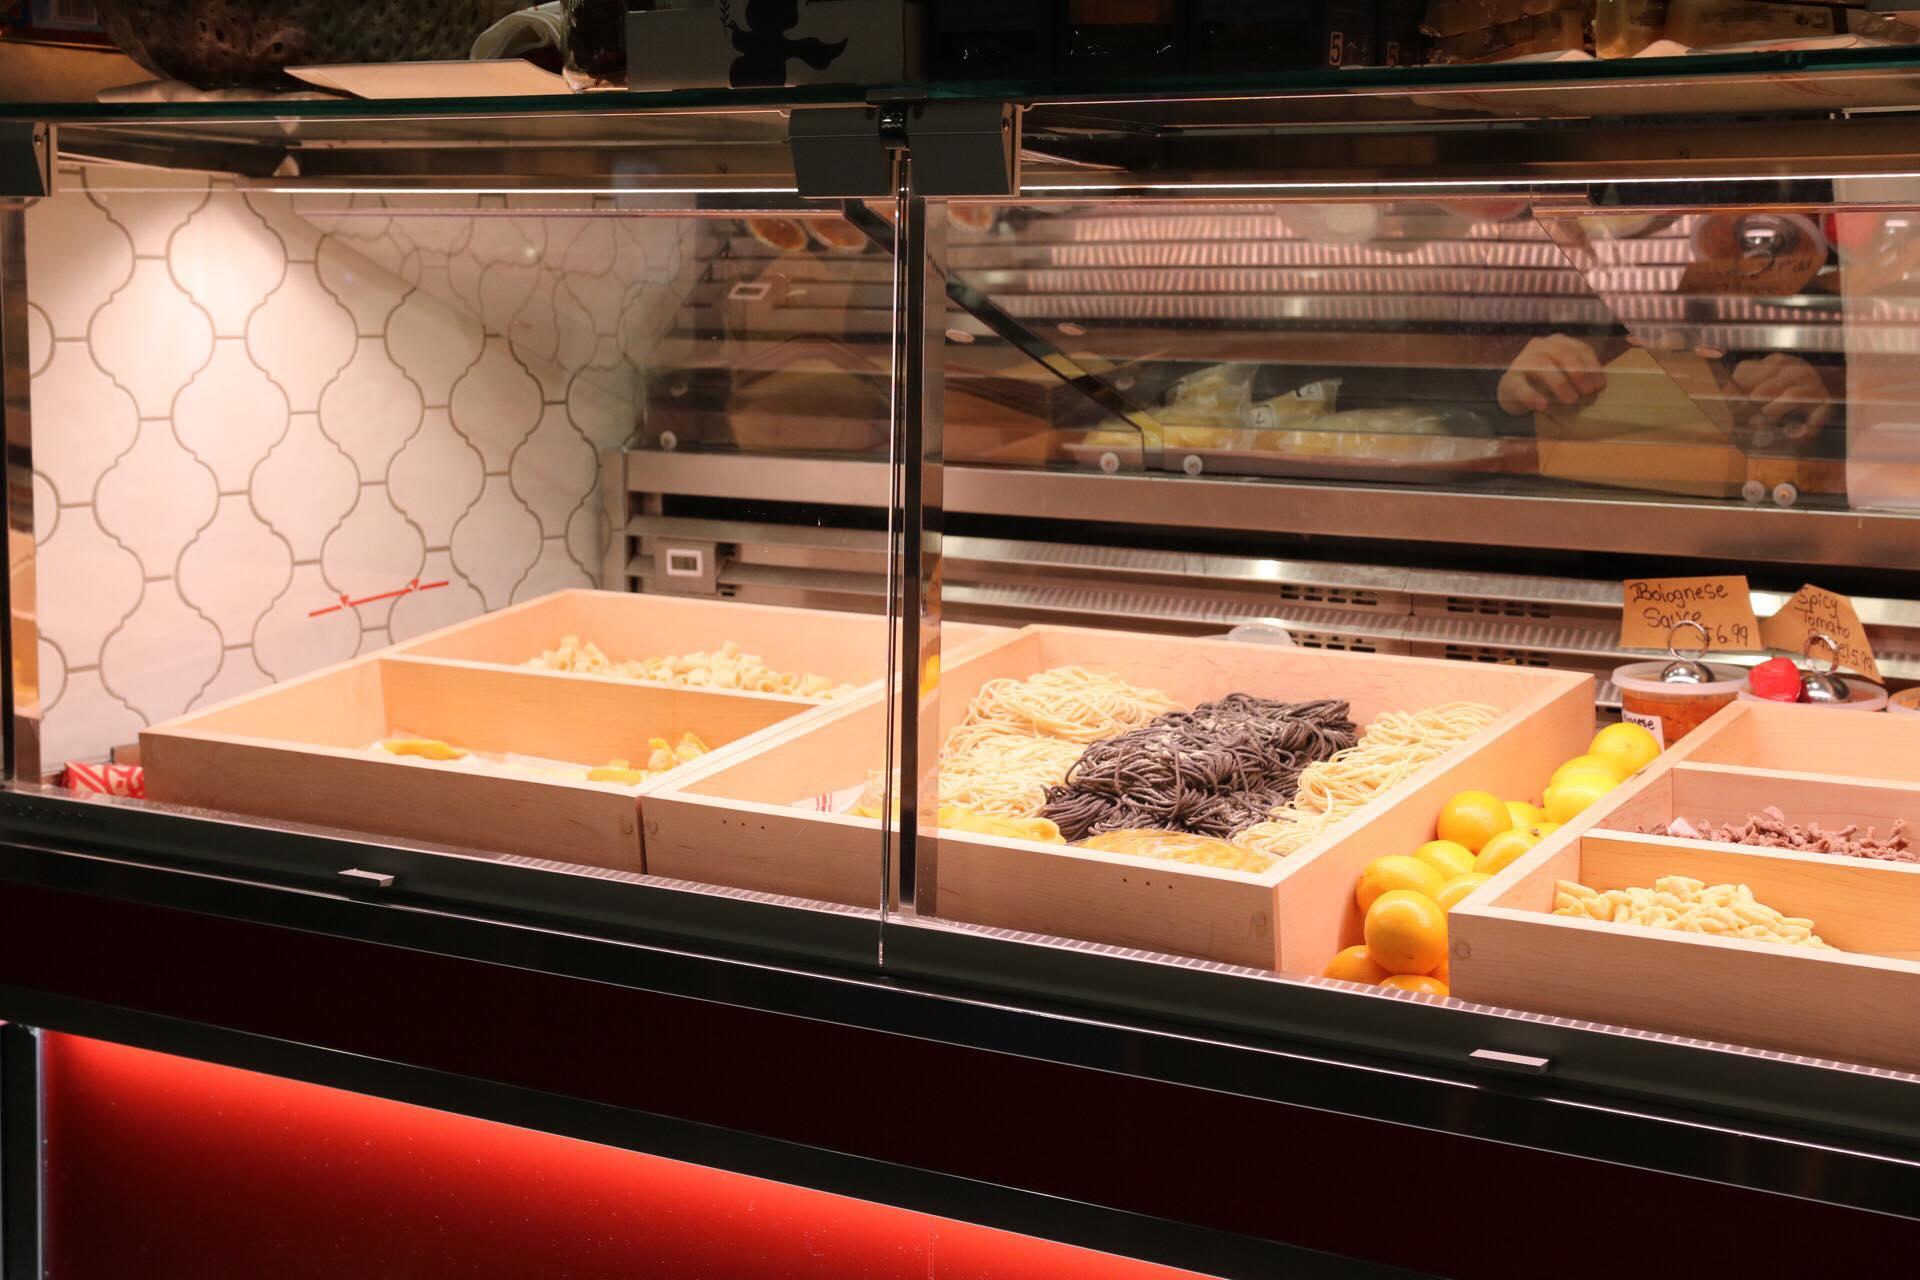 pasta shop display case.jpg